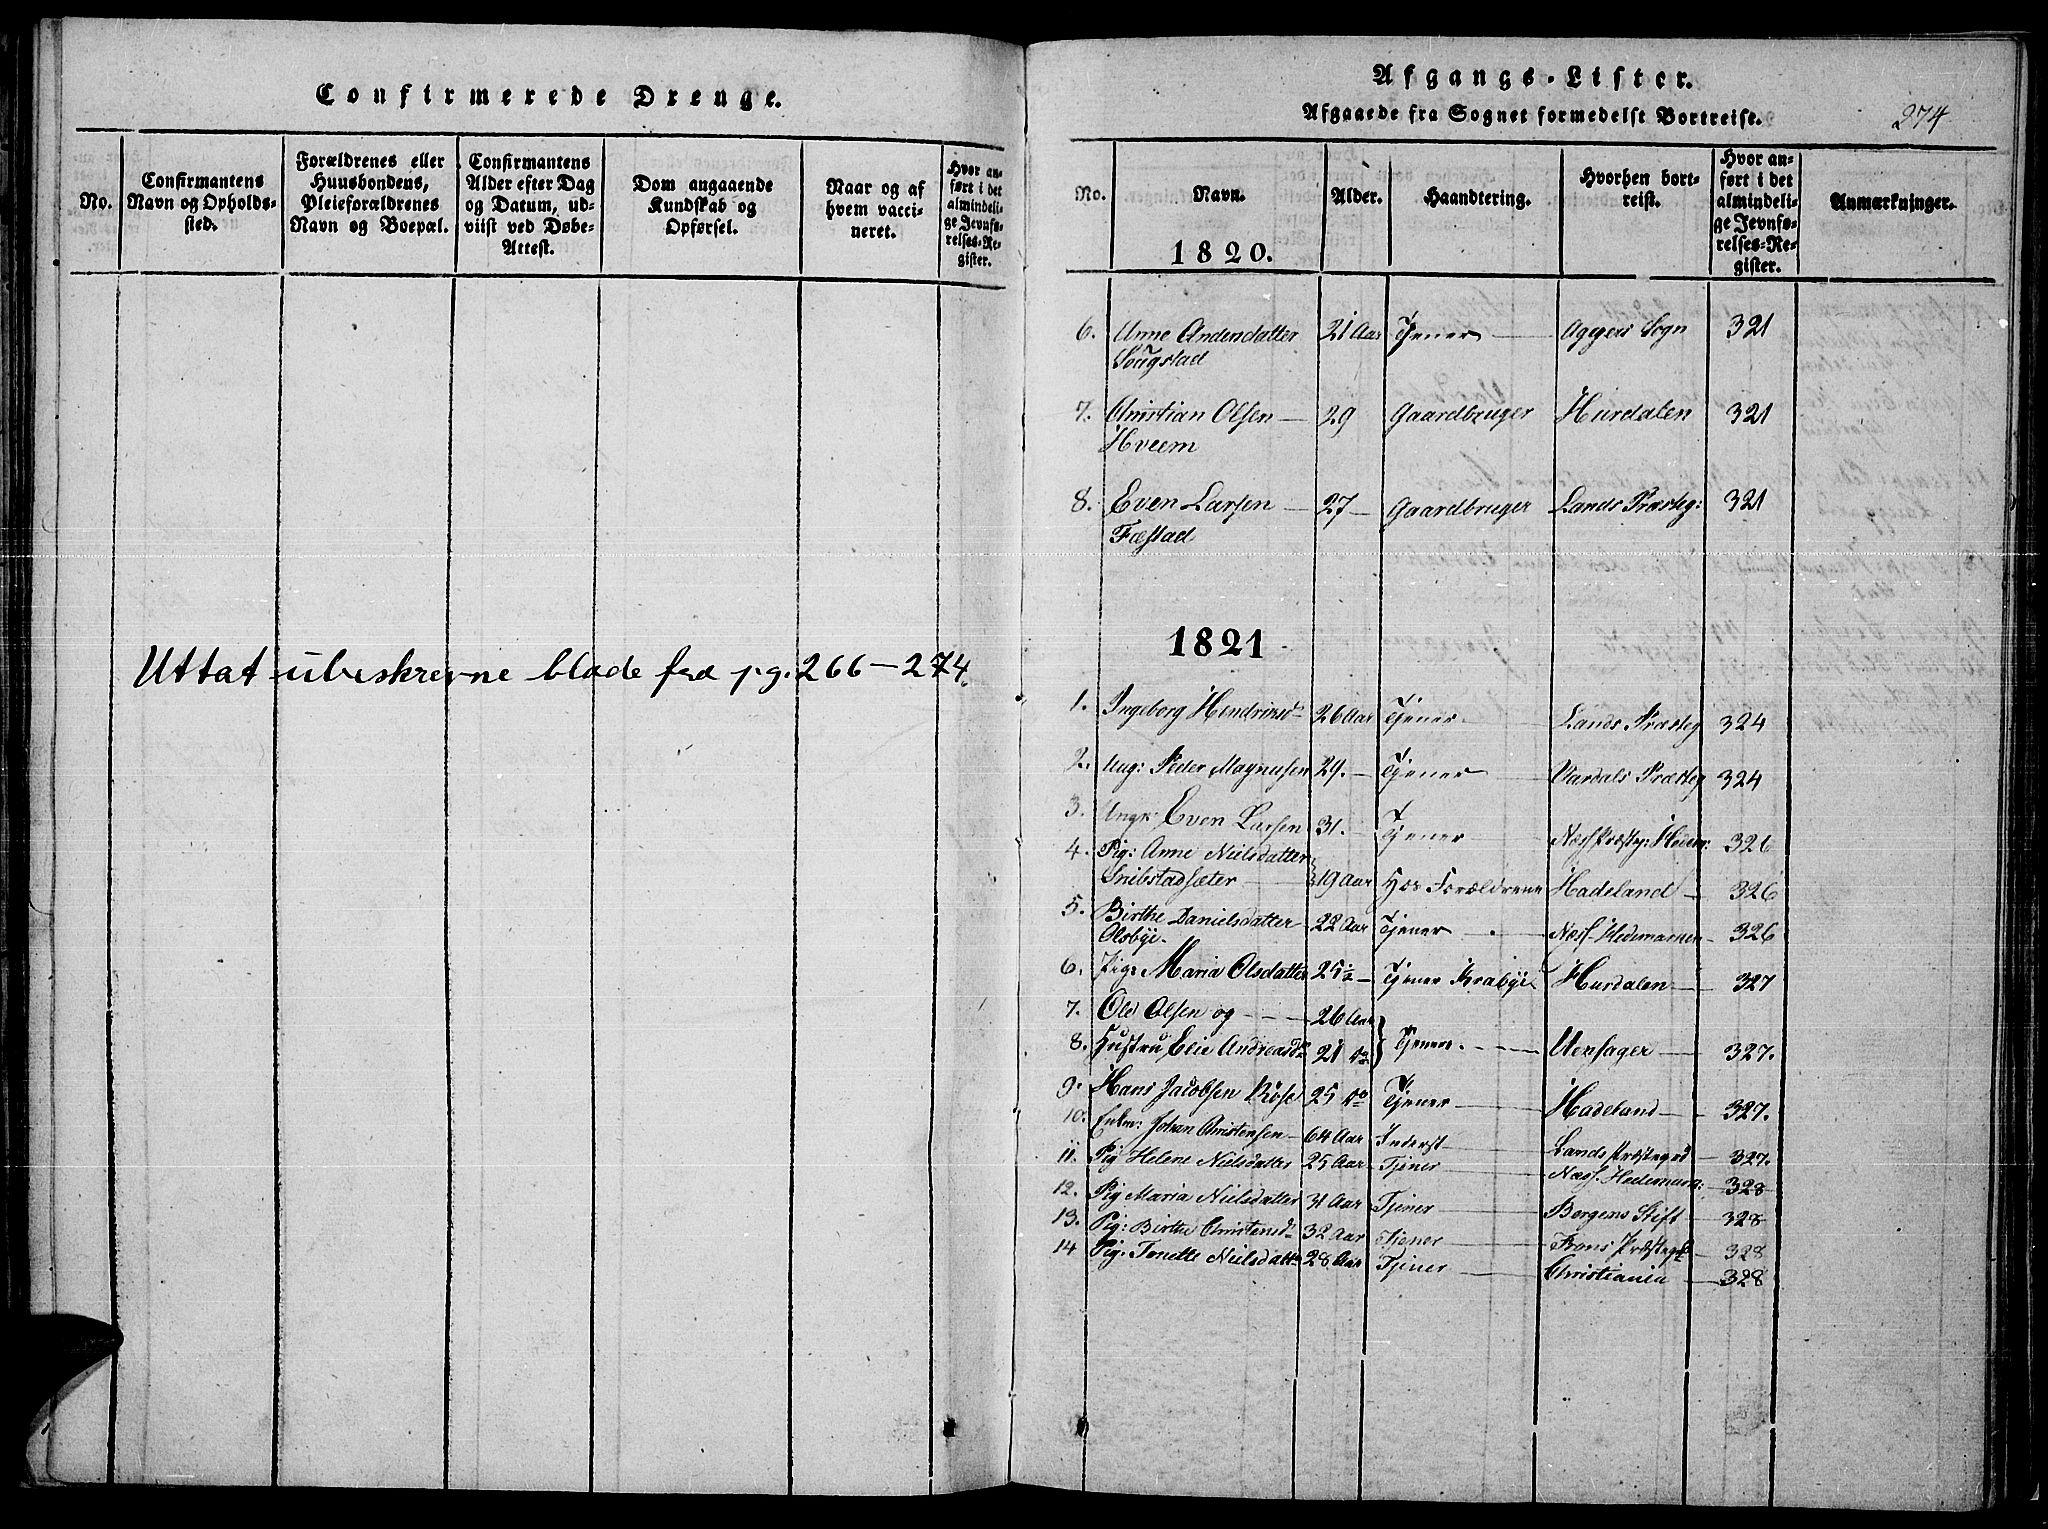 SAH, Toten prestekontor, Ministerialbok nr. 10, 1820-1828, s. 274